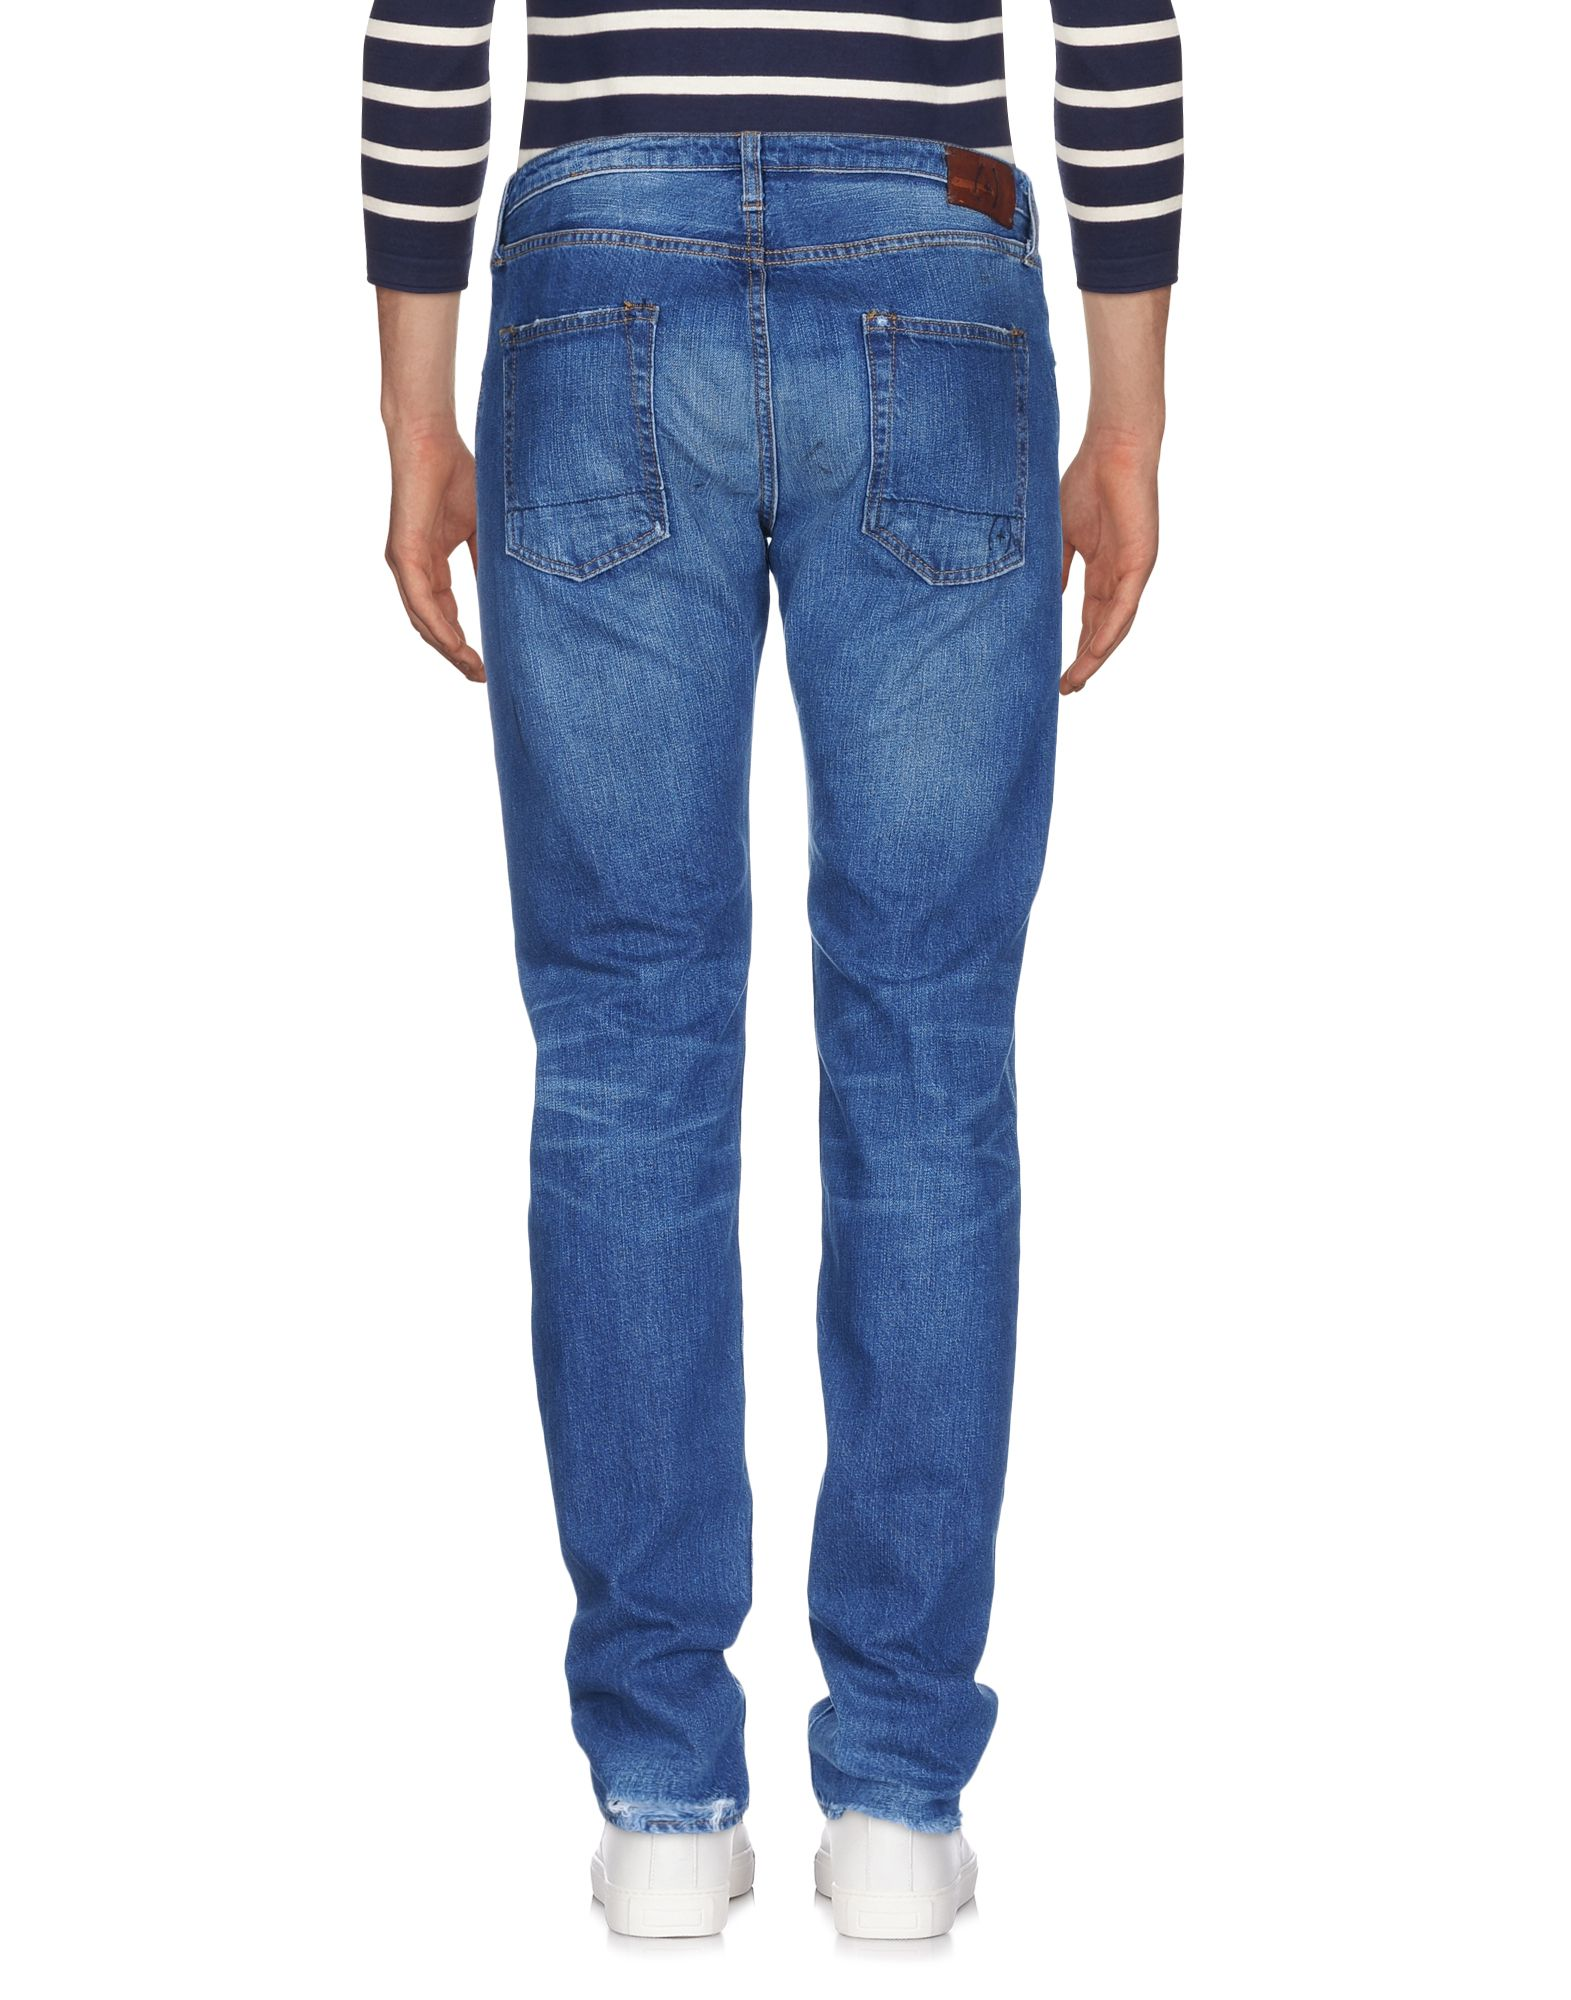 Pantaloni Jeans (+) People Uomo - 42629556LF 42629556LF 42629556LF 0c5f4c